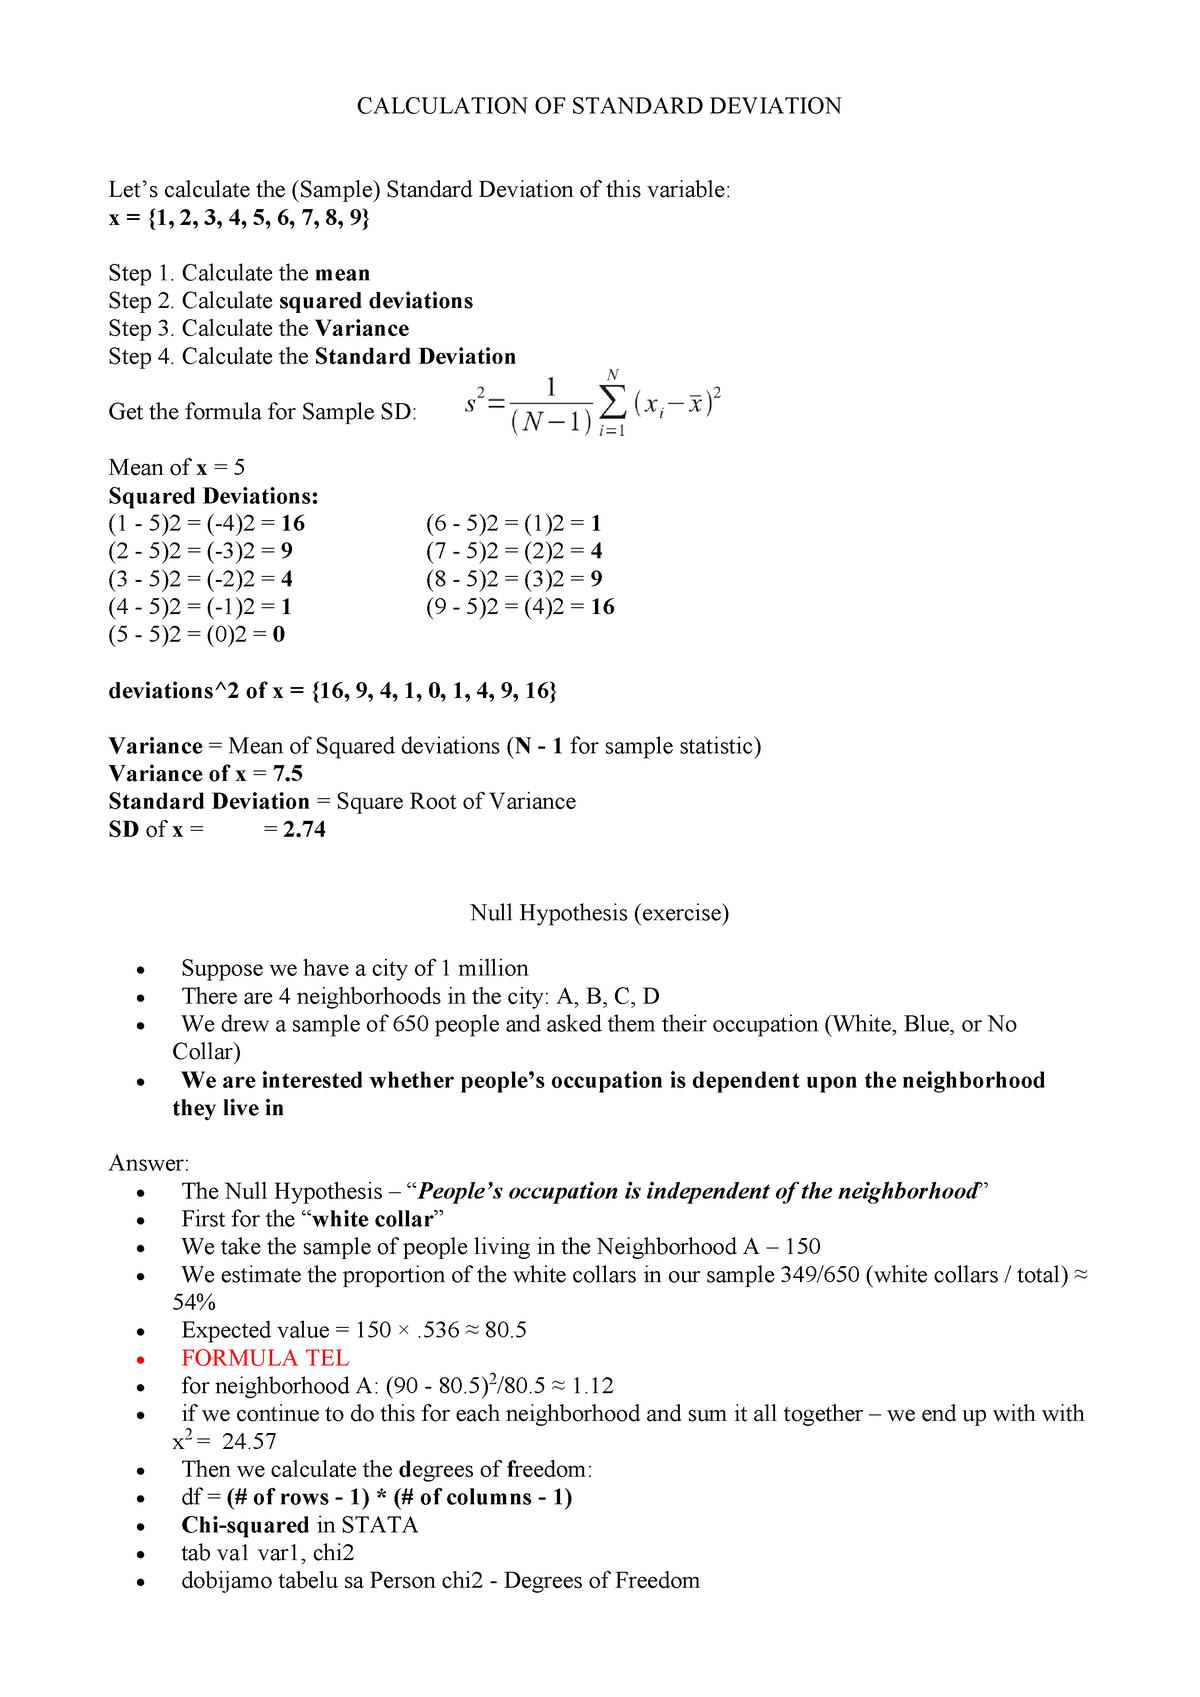 Calculation OF Standard Deviation 200018 Uni Wien StuDocu